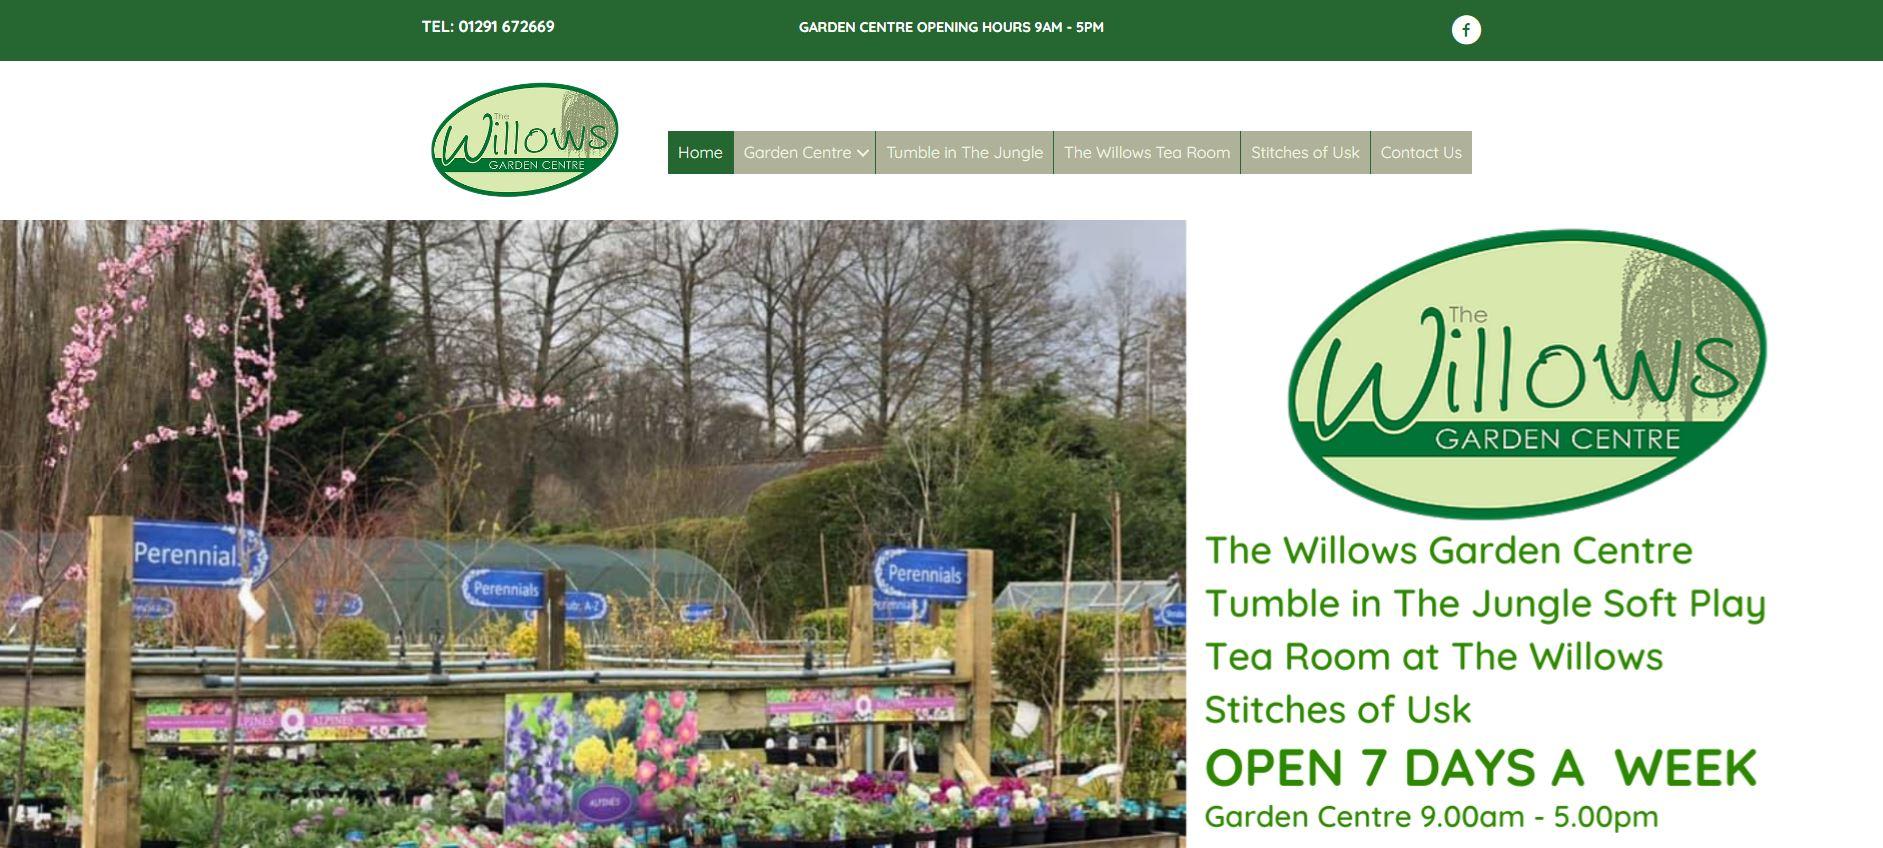 Willows Website Screen Capture